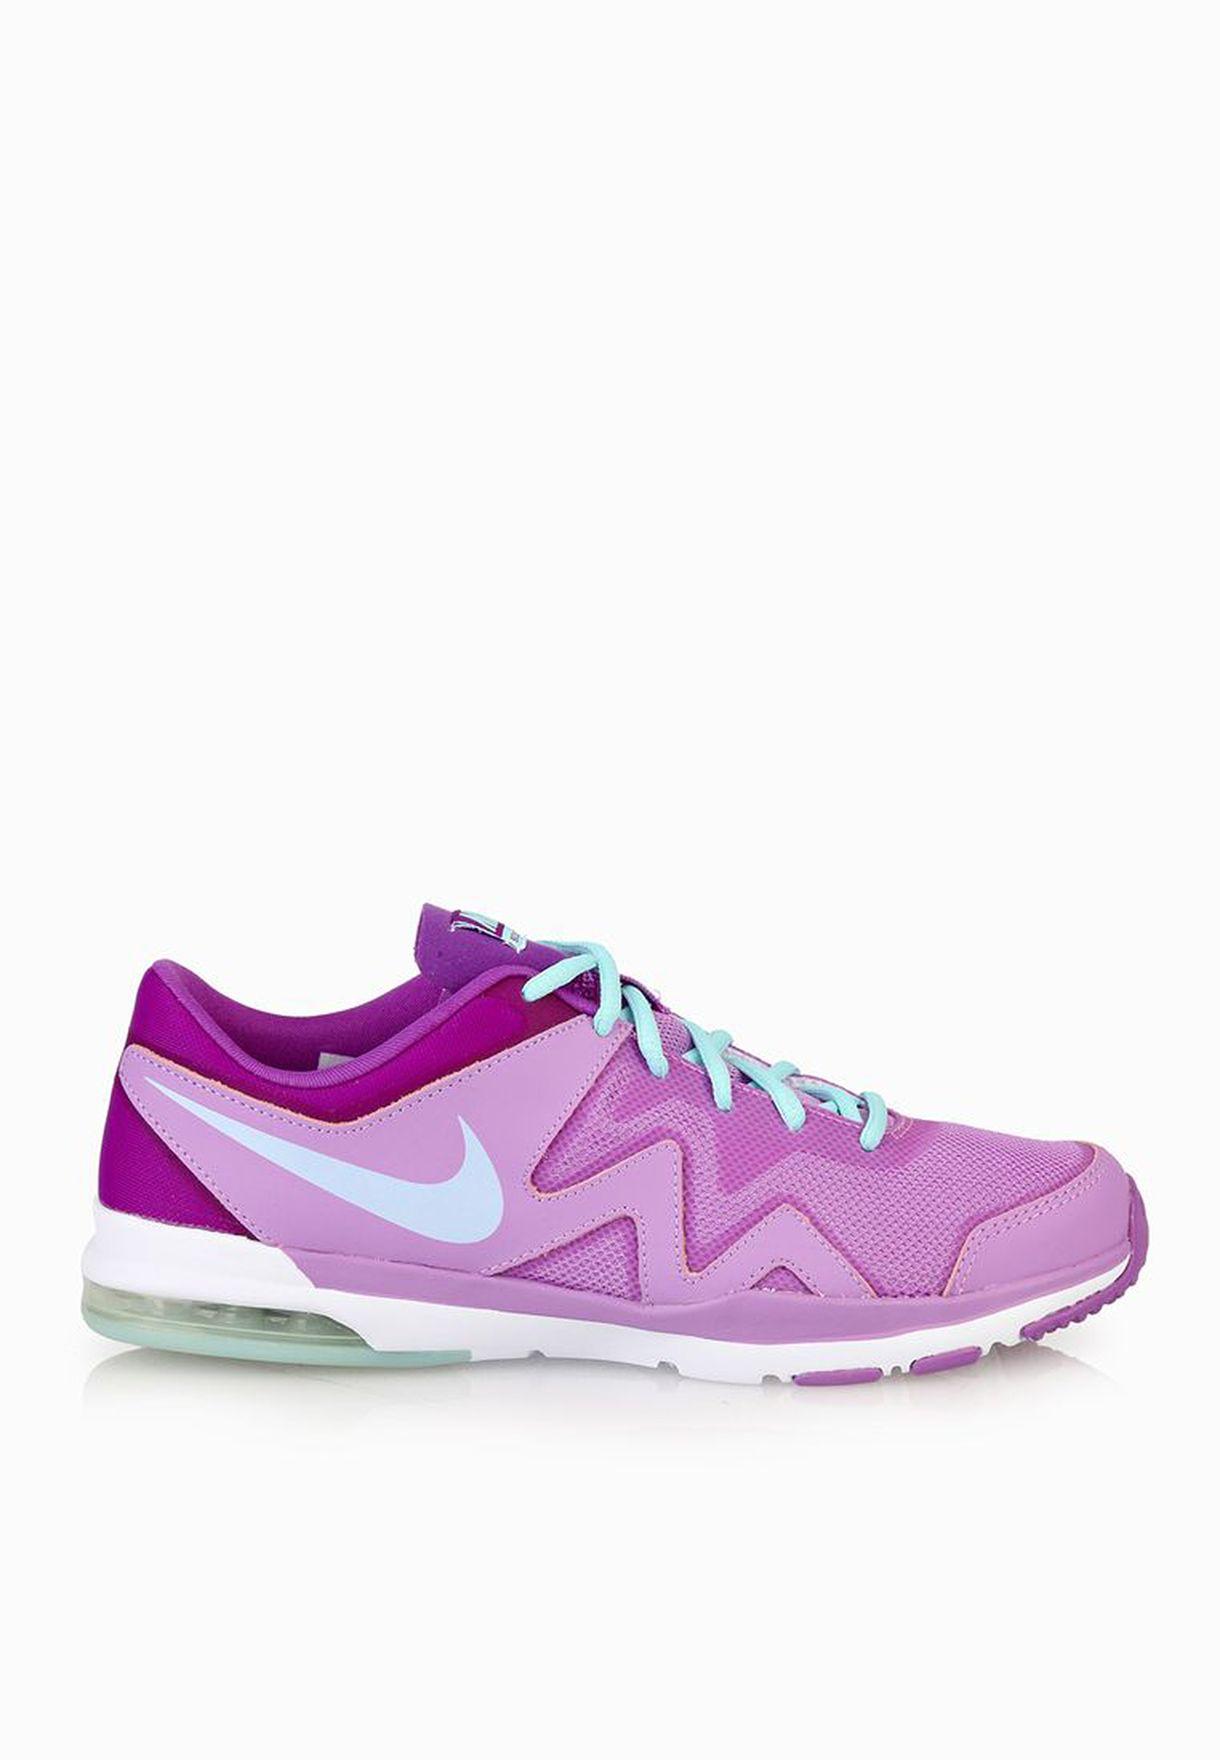 finest selection 67f25 a7fb6 Shop Nike purple Air Sculpt Tr 2 704922-501 for Women in Saudi -  NI727SH78NQJ